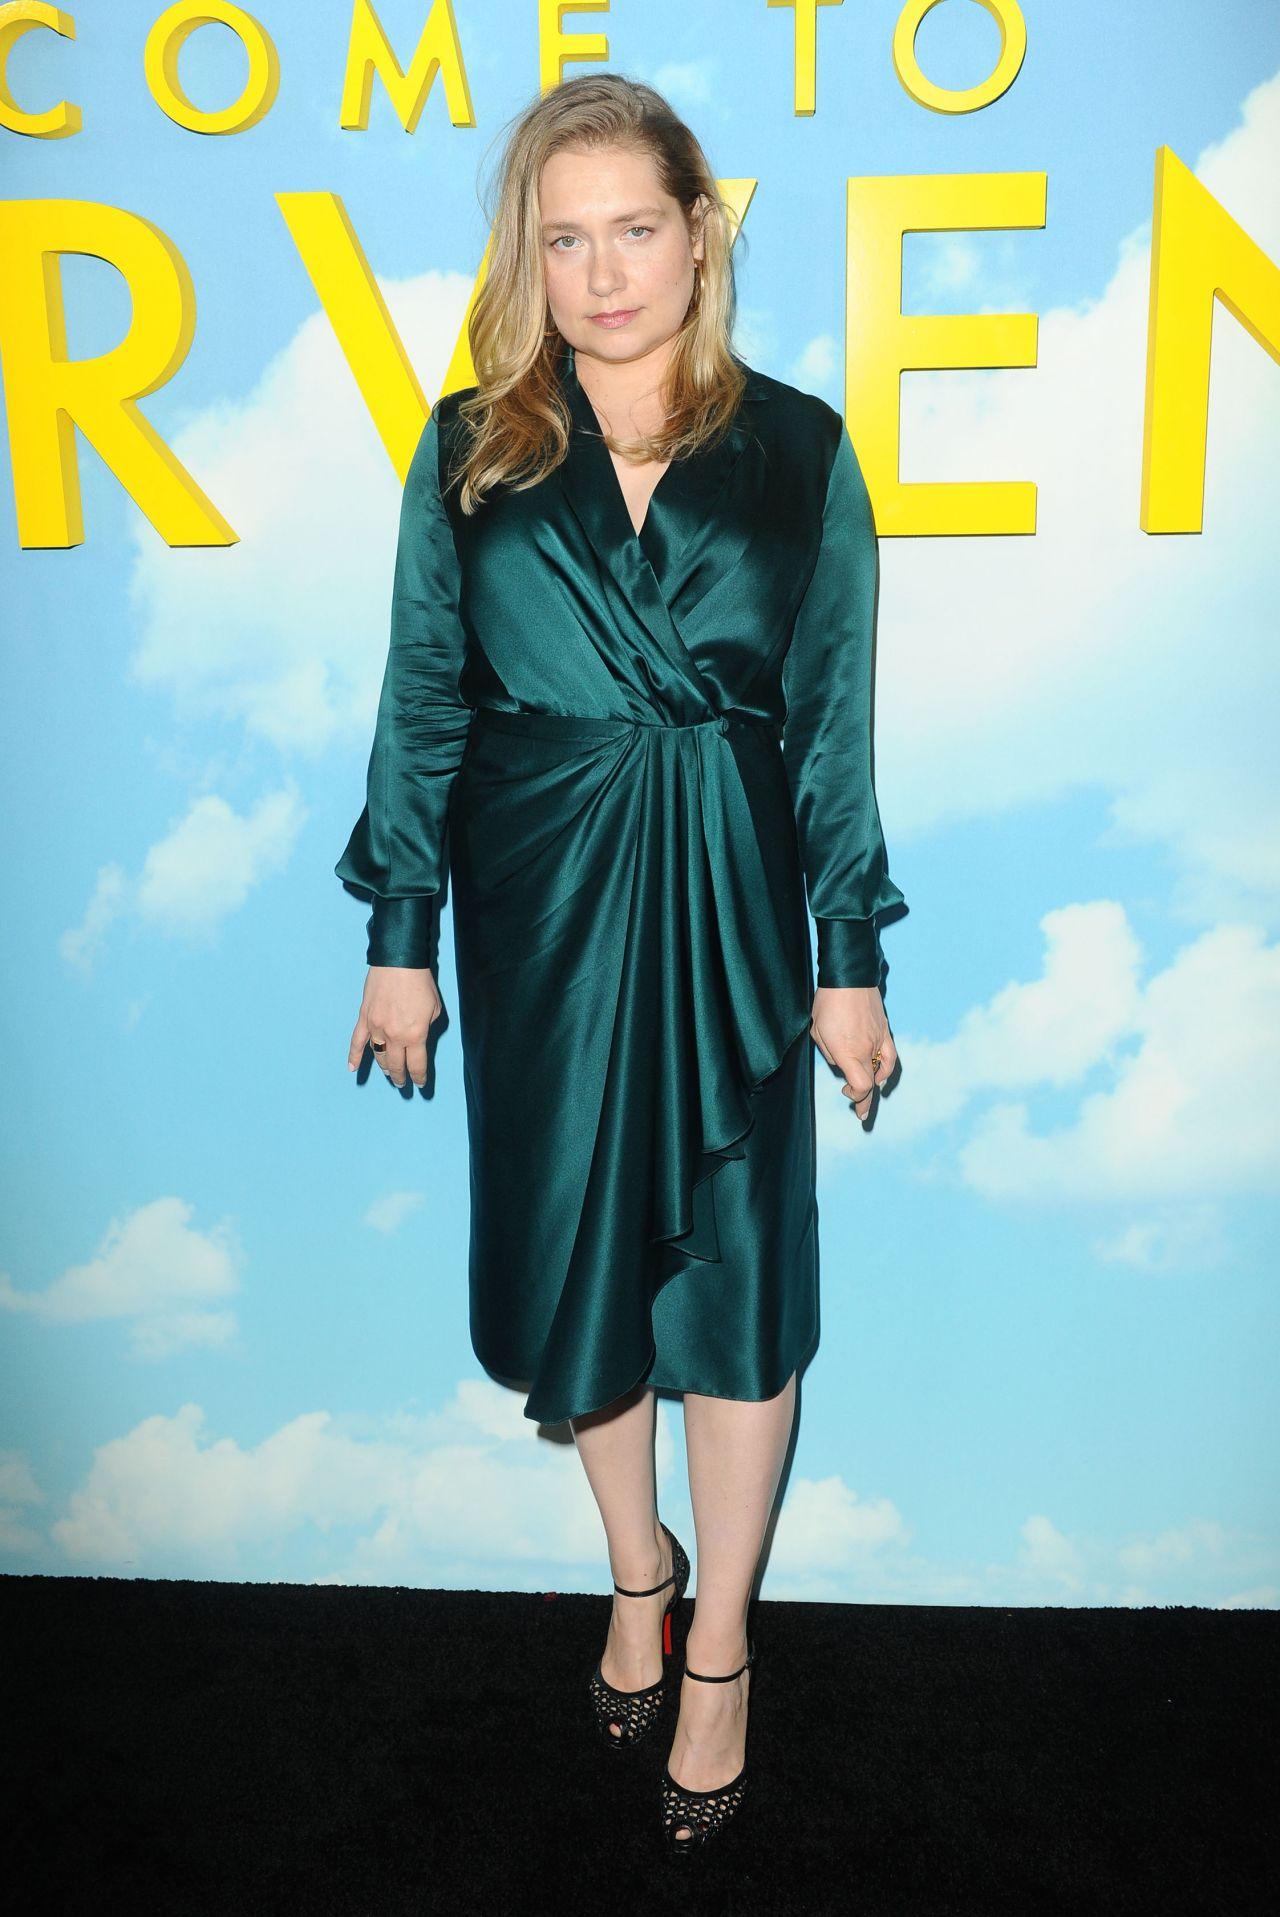 Merritt Wever - Welcome To Marwen Premiere in LA • CelebMafia